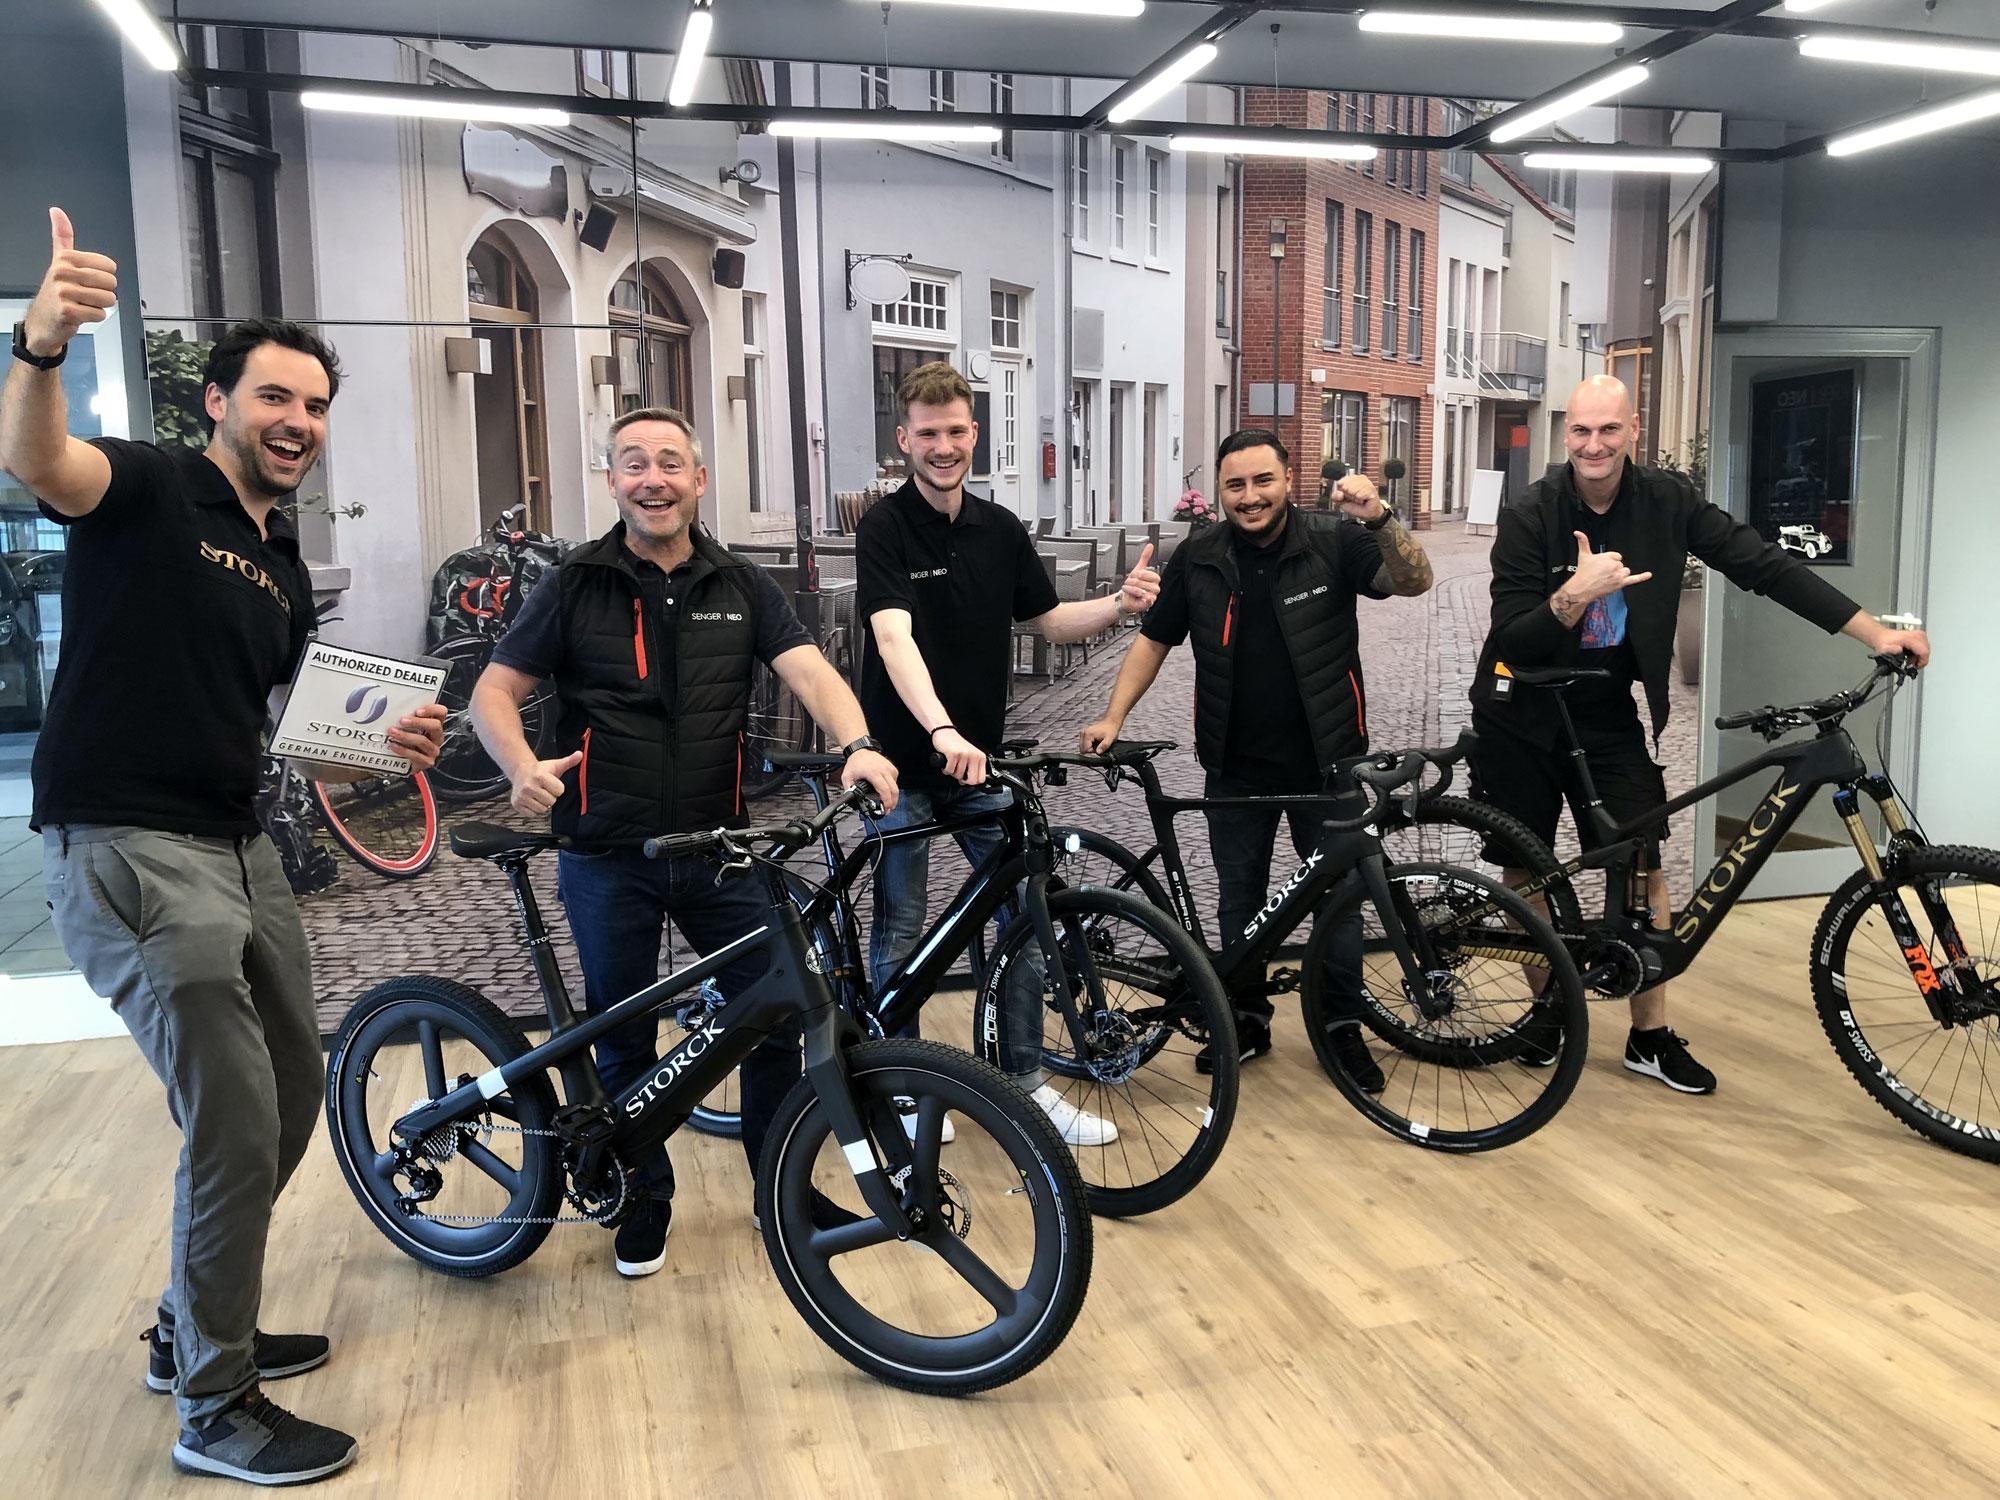 STORCK Bicycle mit SENGER|NEO in weiterer E-Mobility Kooperation